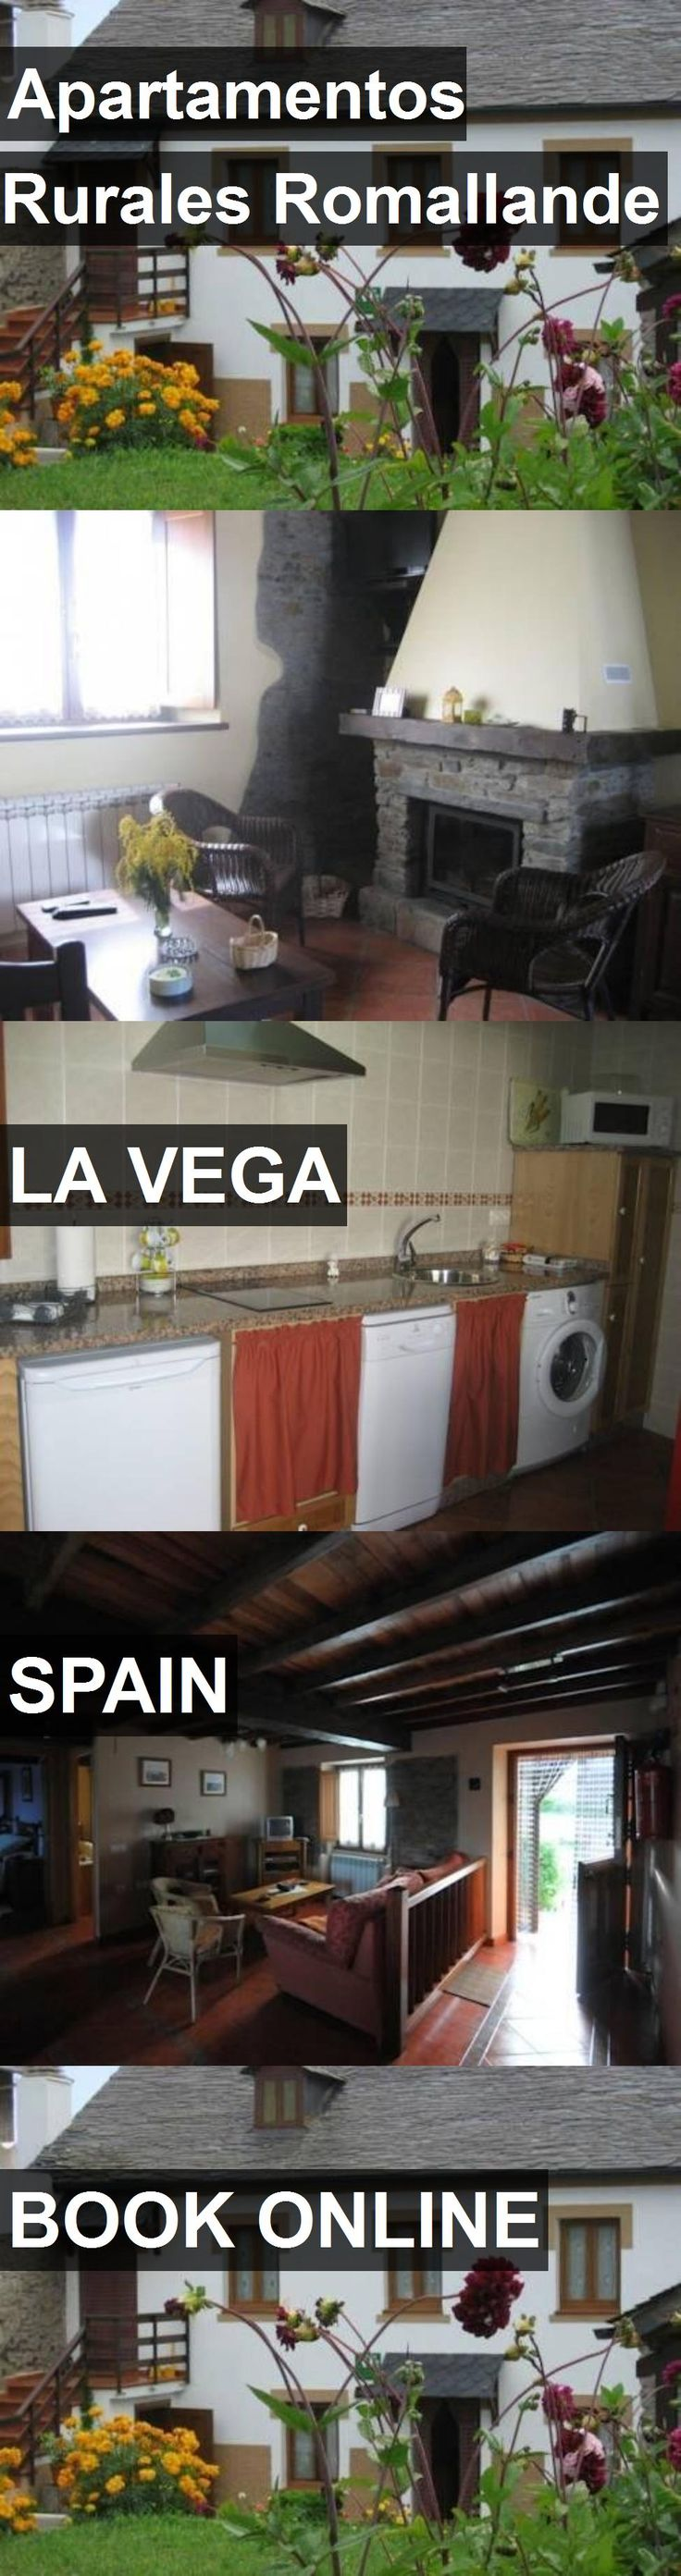 Hotel Apartamentos Rurales Romallande in La Vega, Spain. For more information, photos, reviews and best prices please follow the link. #Spain #LaVega #travel #vacation #hotel